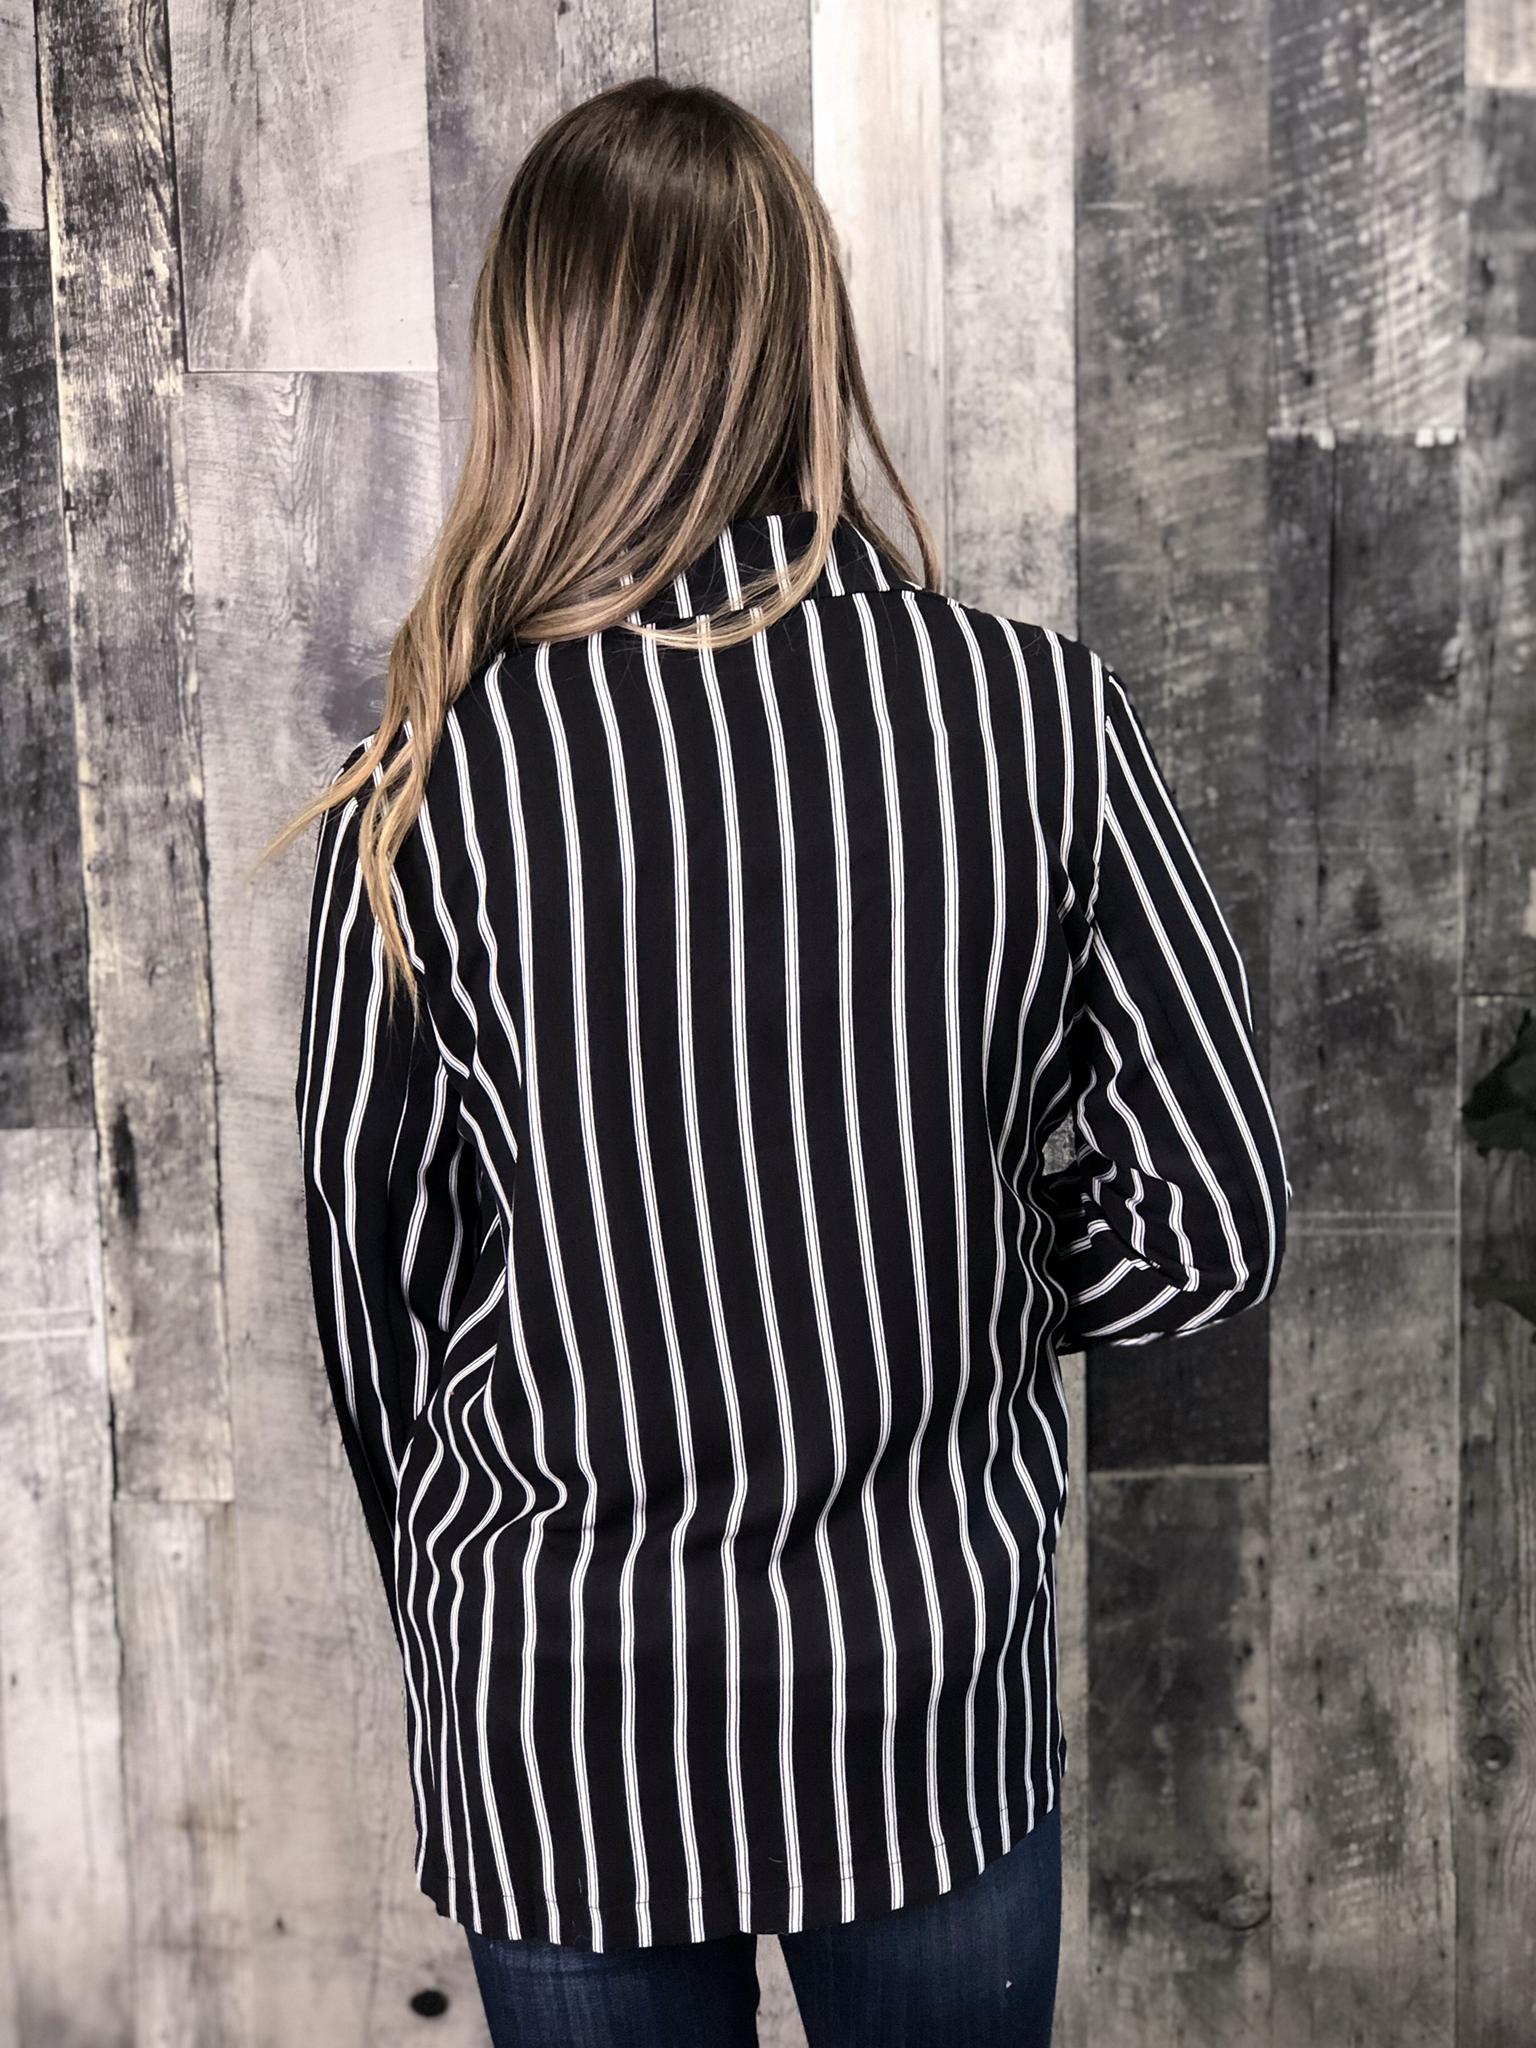 Black and White Stripe Blazer